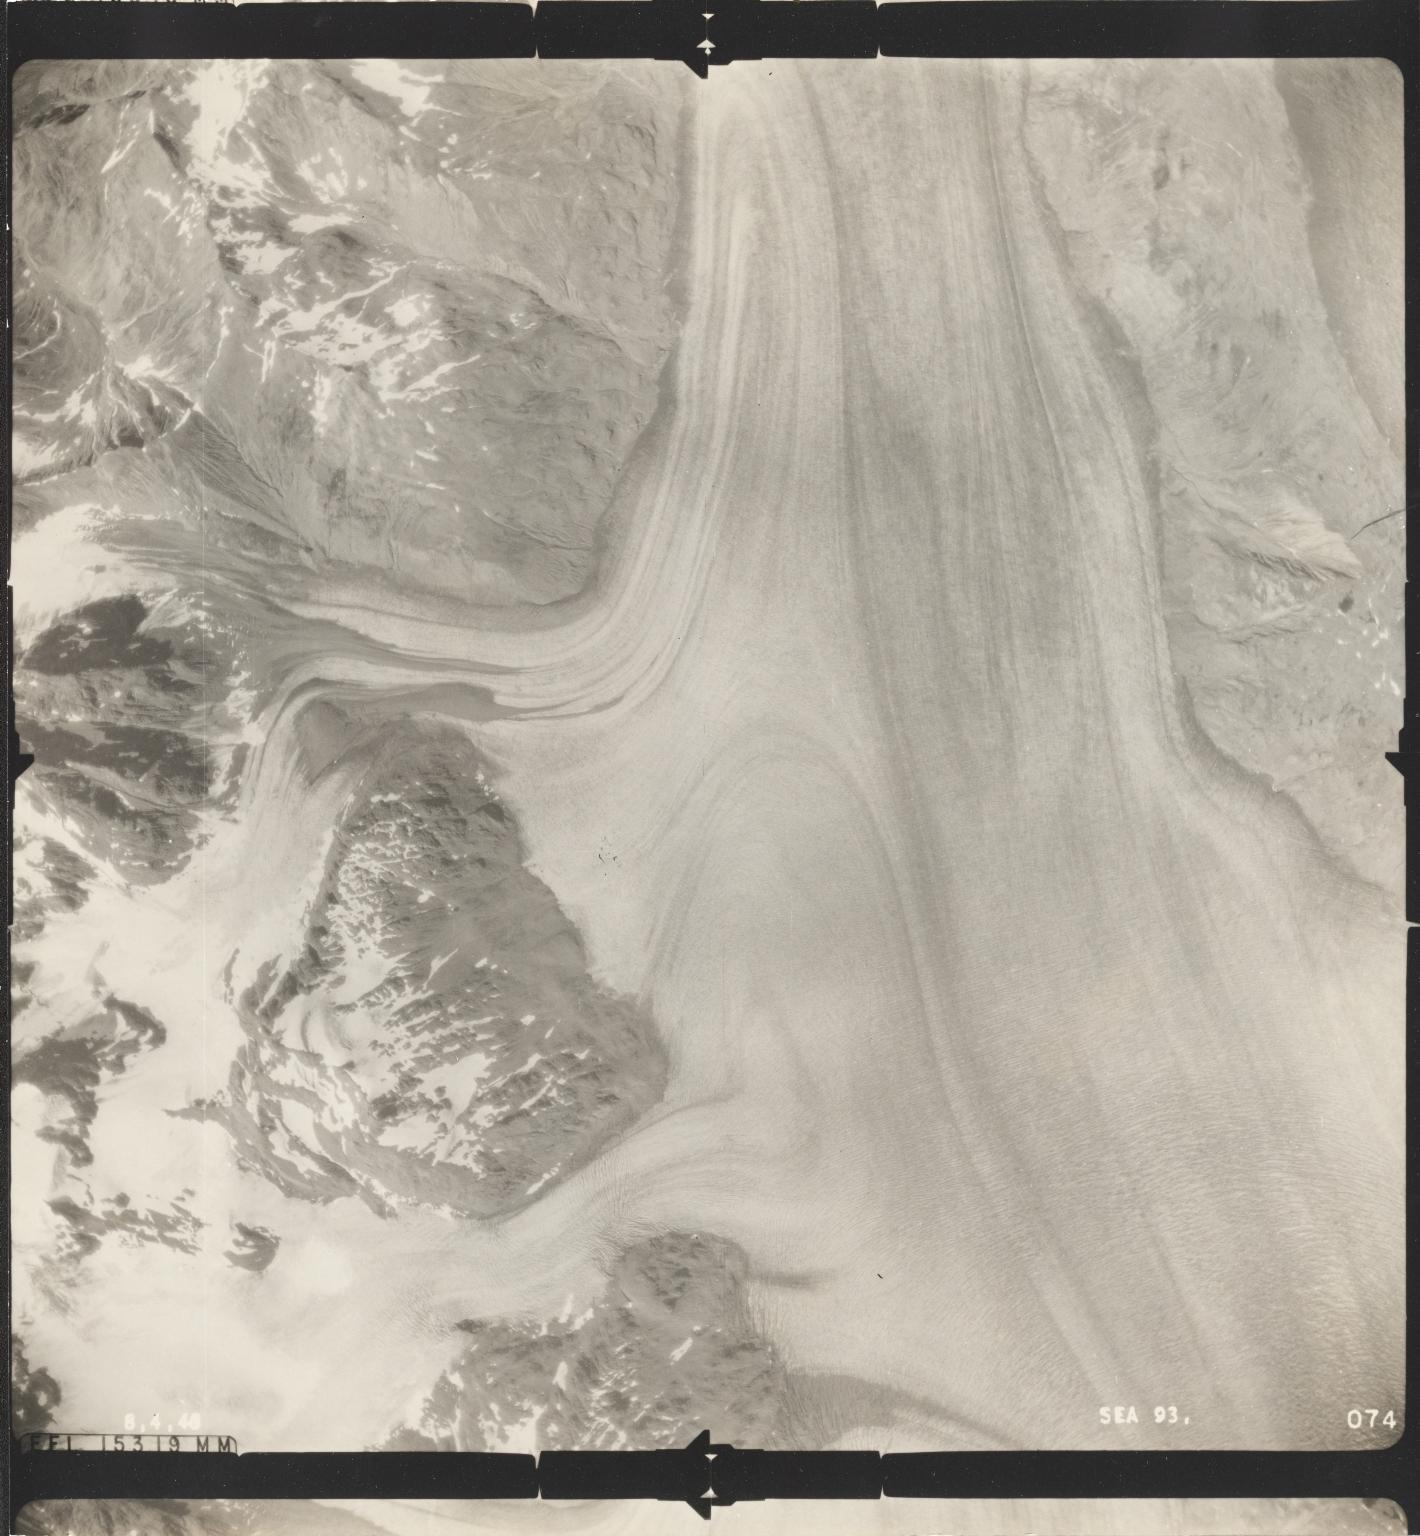 Plateau Glacier, aerial photograph SEA 93 074, Alaska